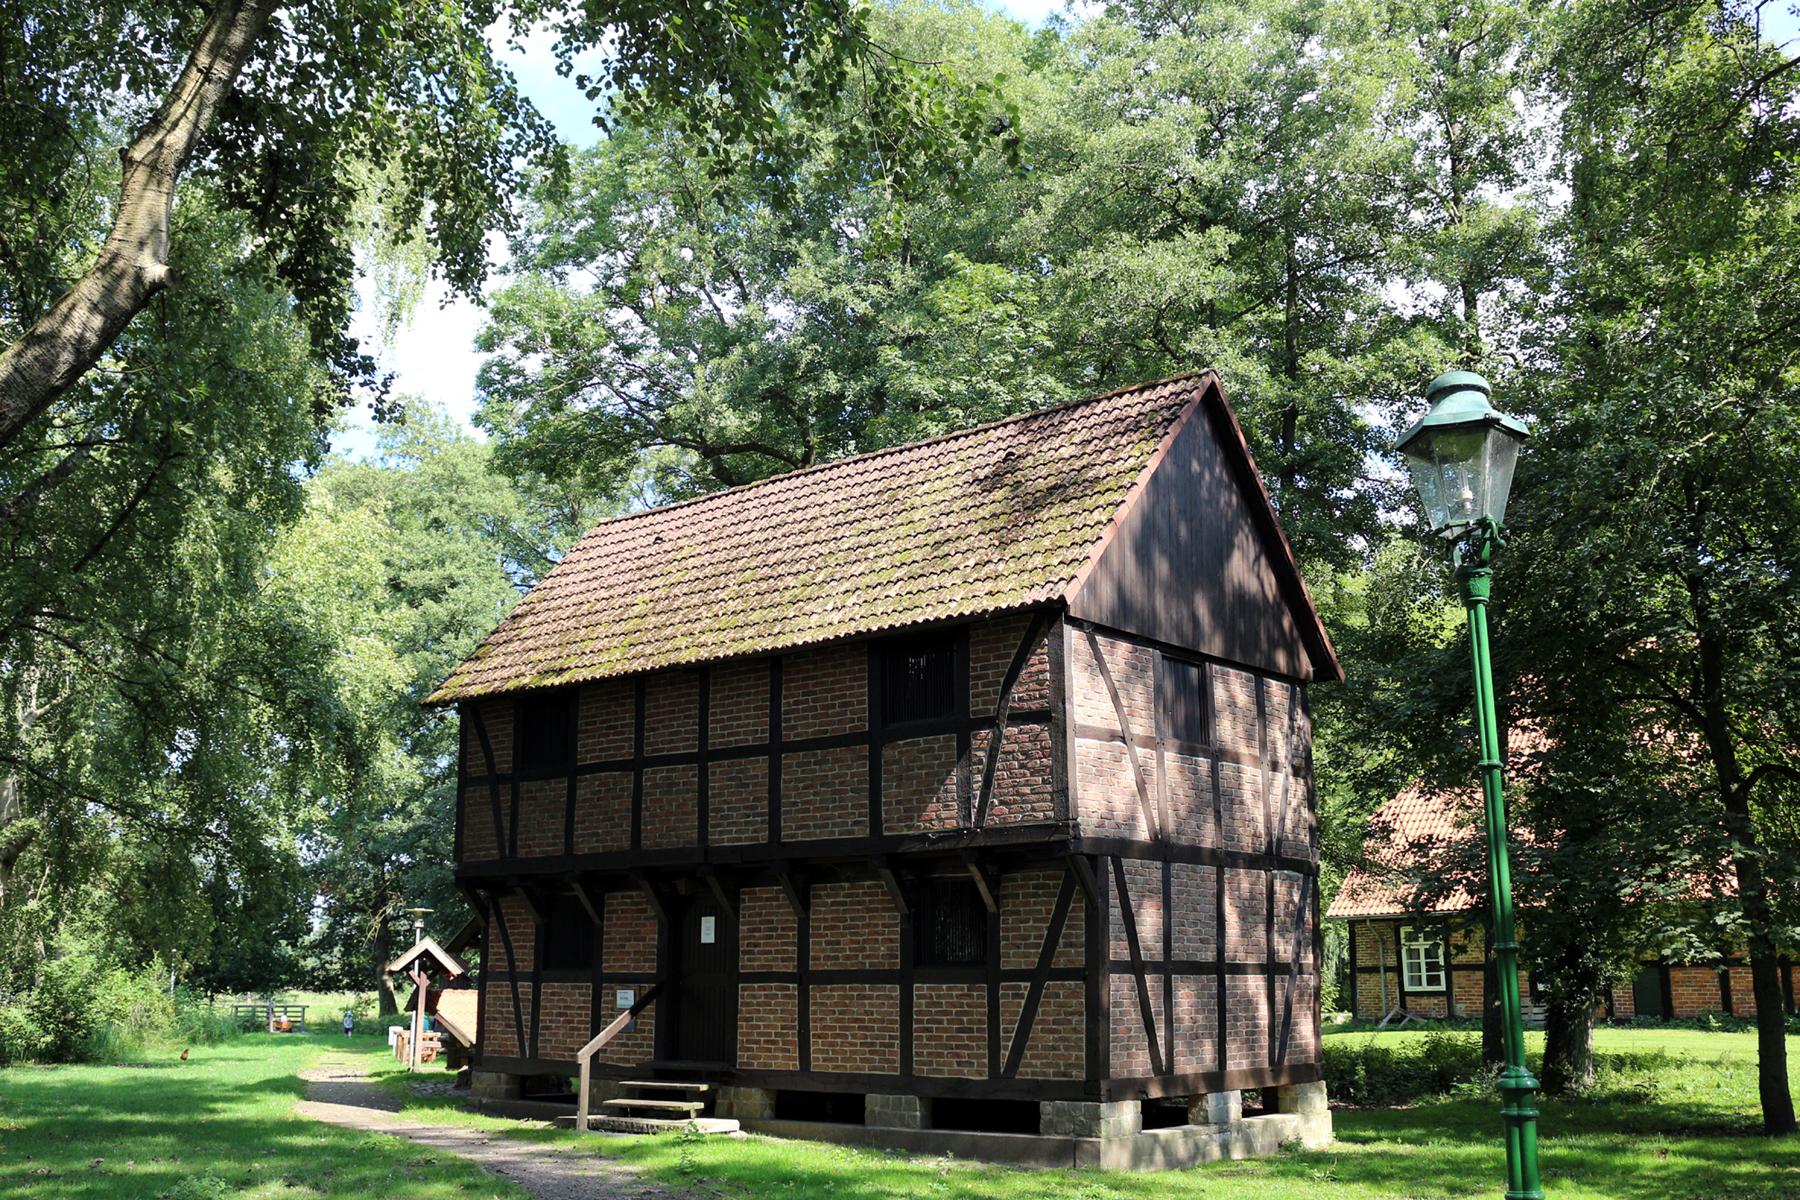 Haus der Landschaft Knesebeck